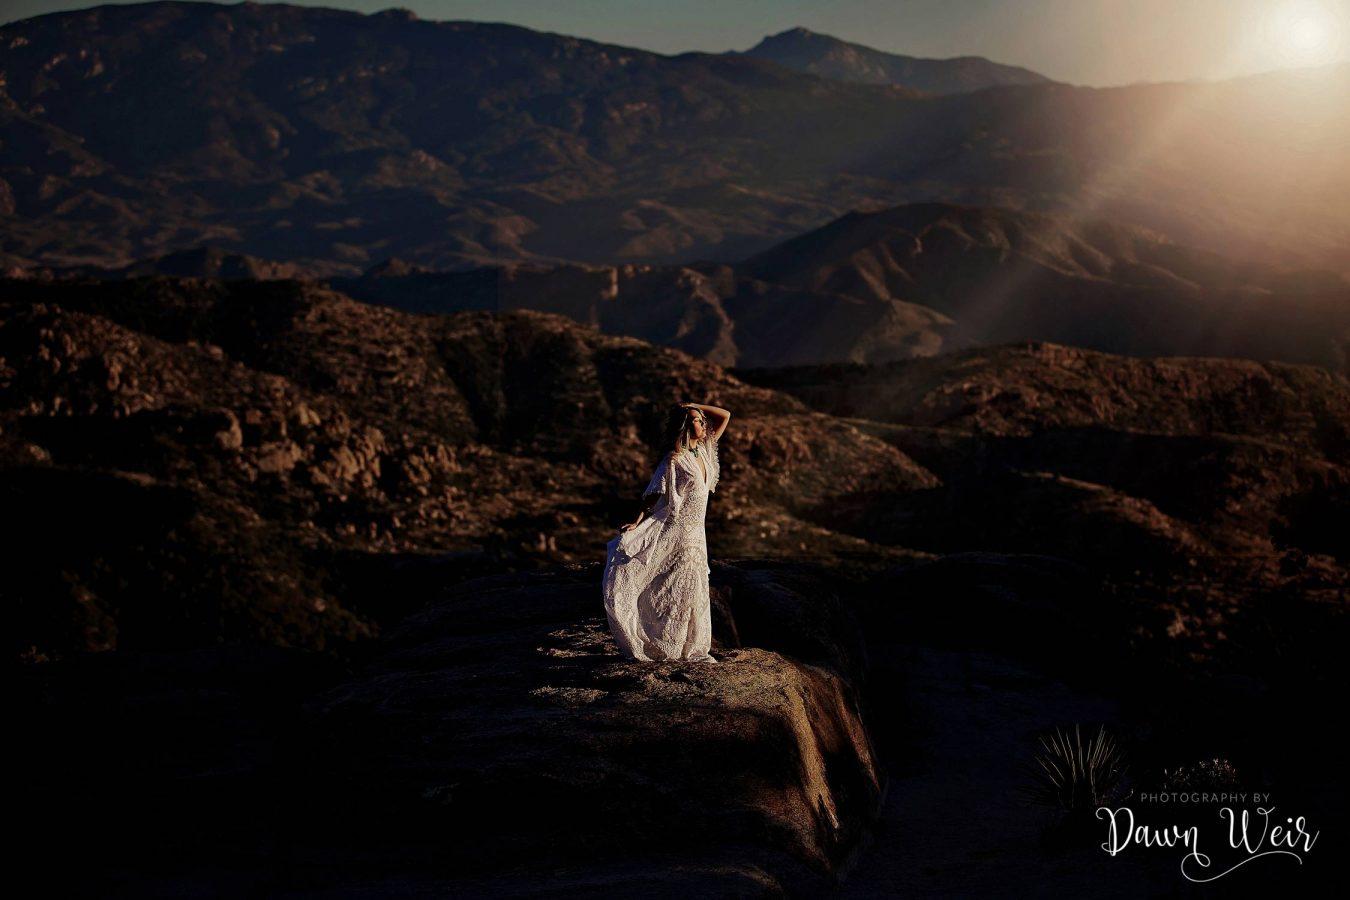 reclamation-dress-photo-by-edmonton-model-photographer-dawn-weir-mt-lemmon-tuscon-arizona